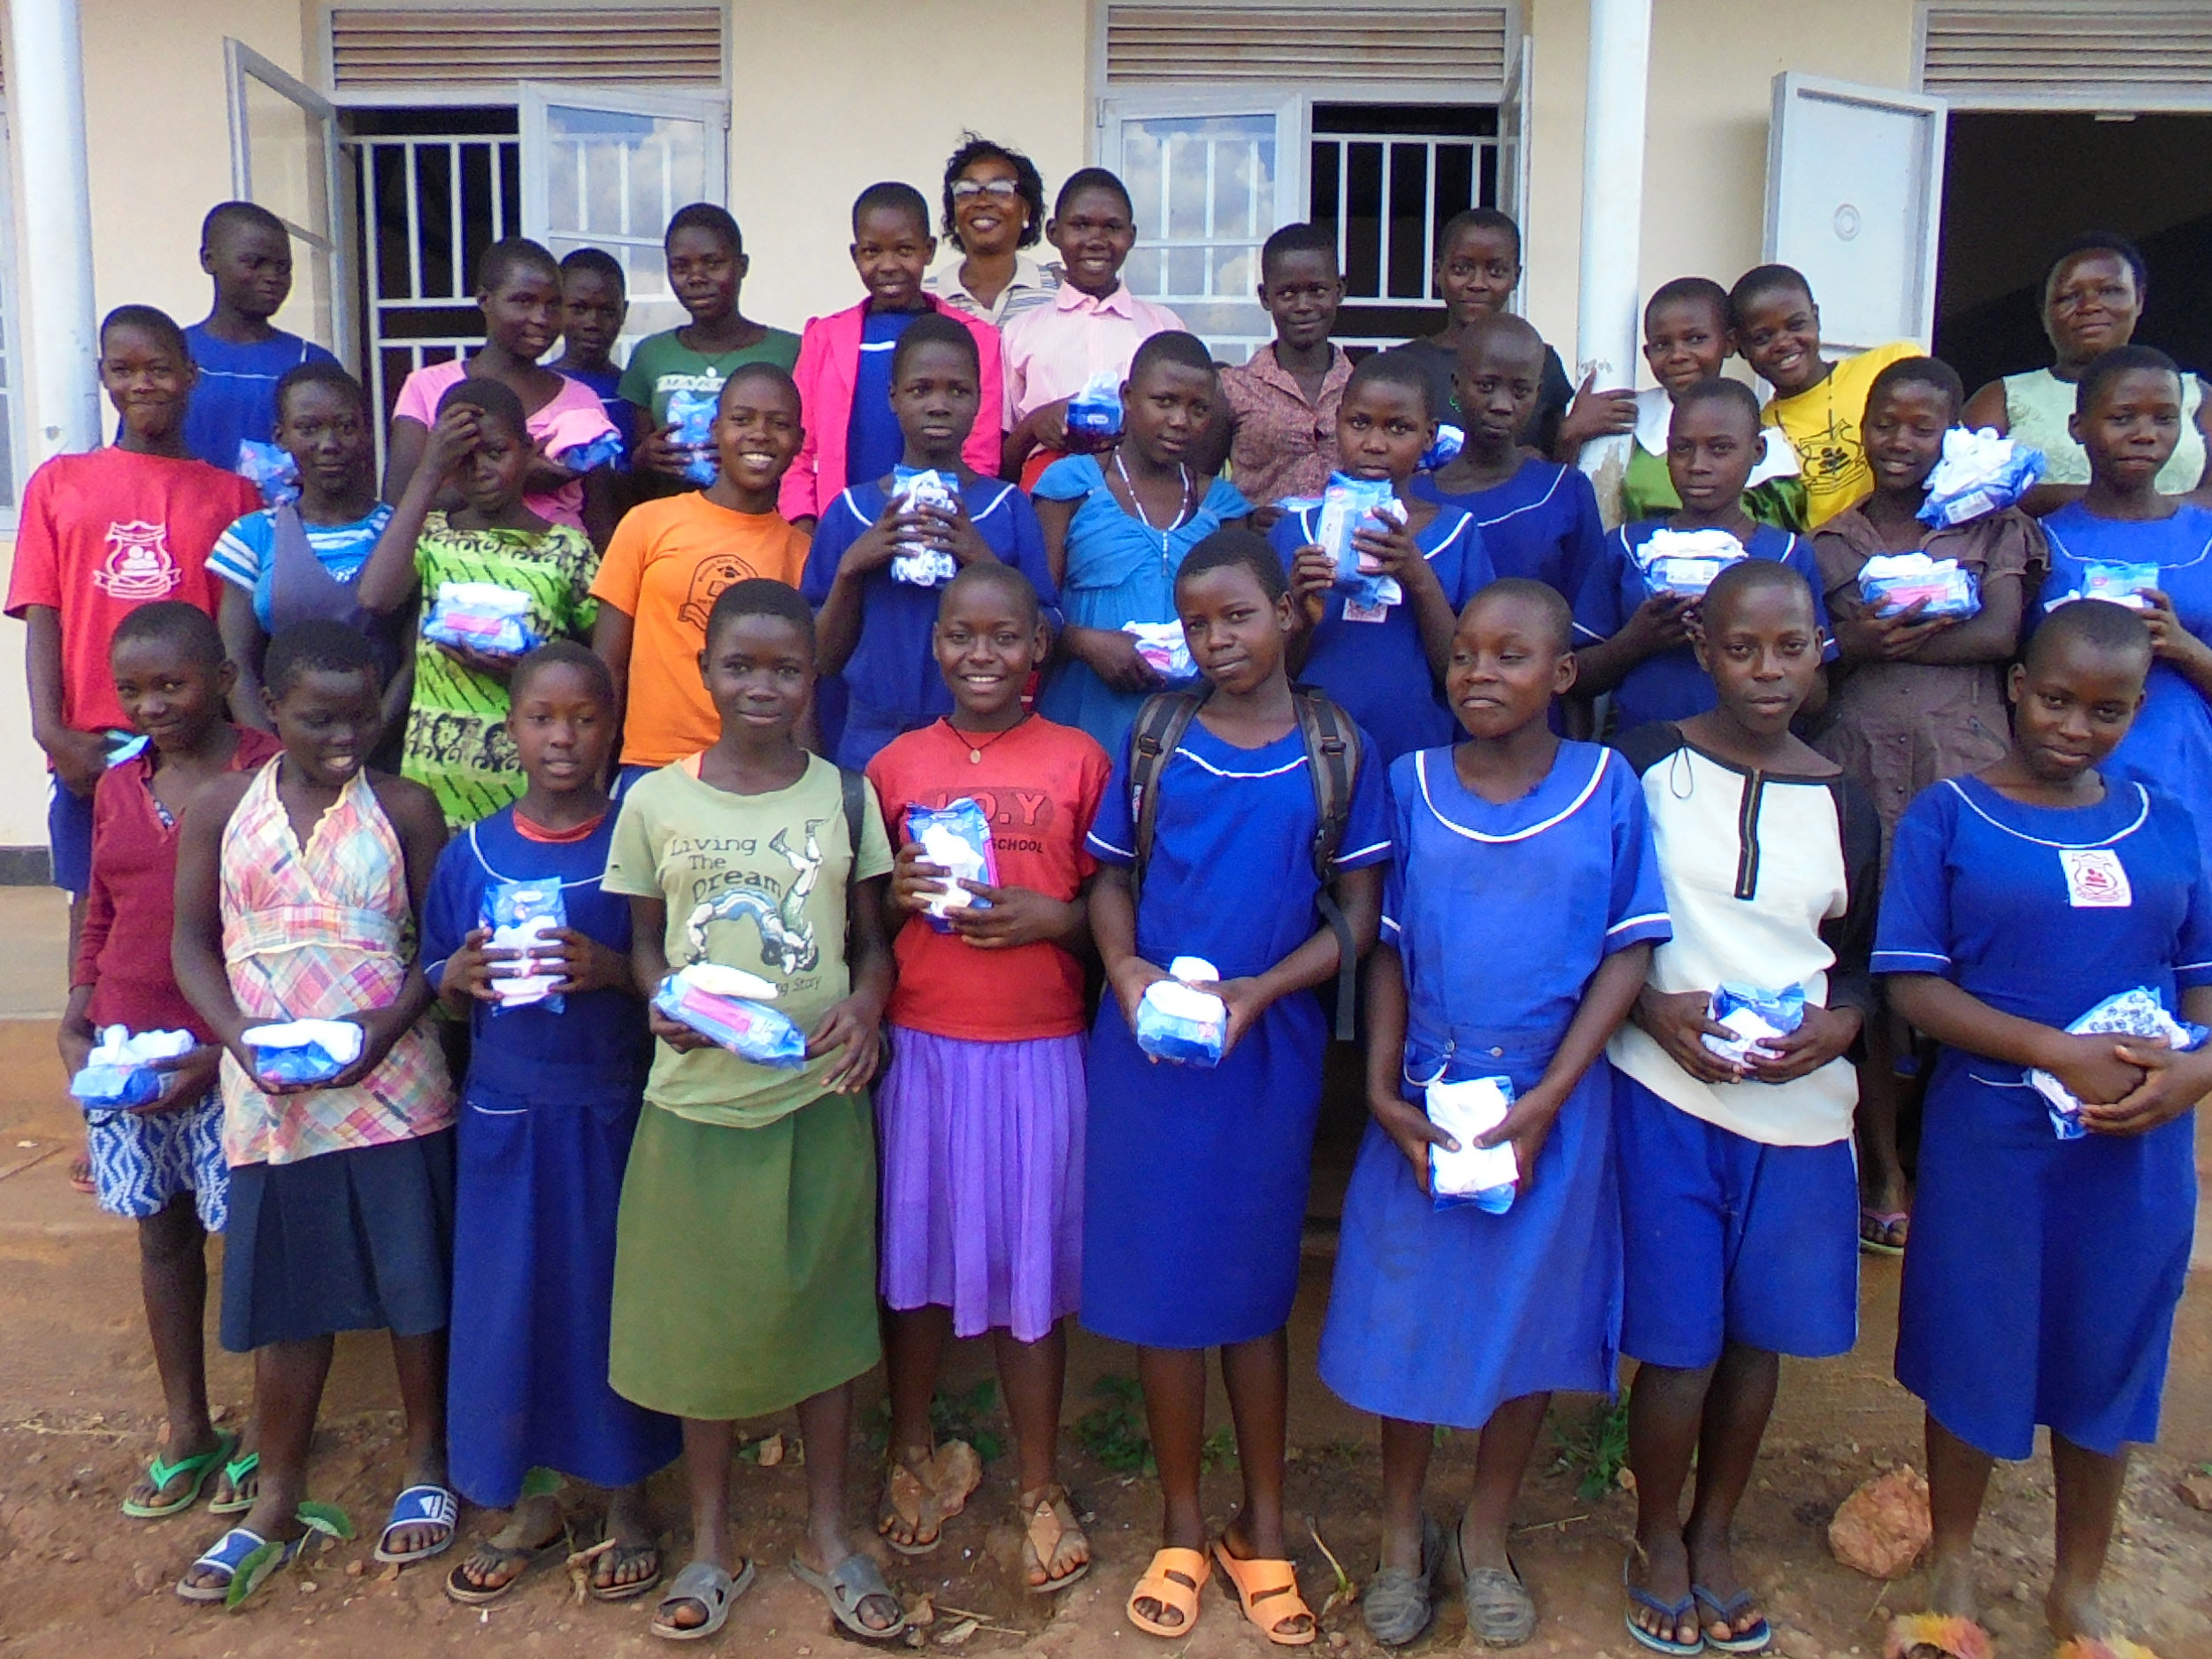 Mpumudde Primary School